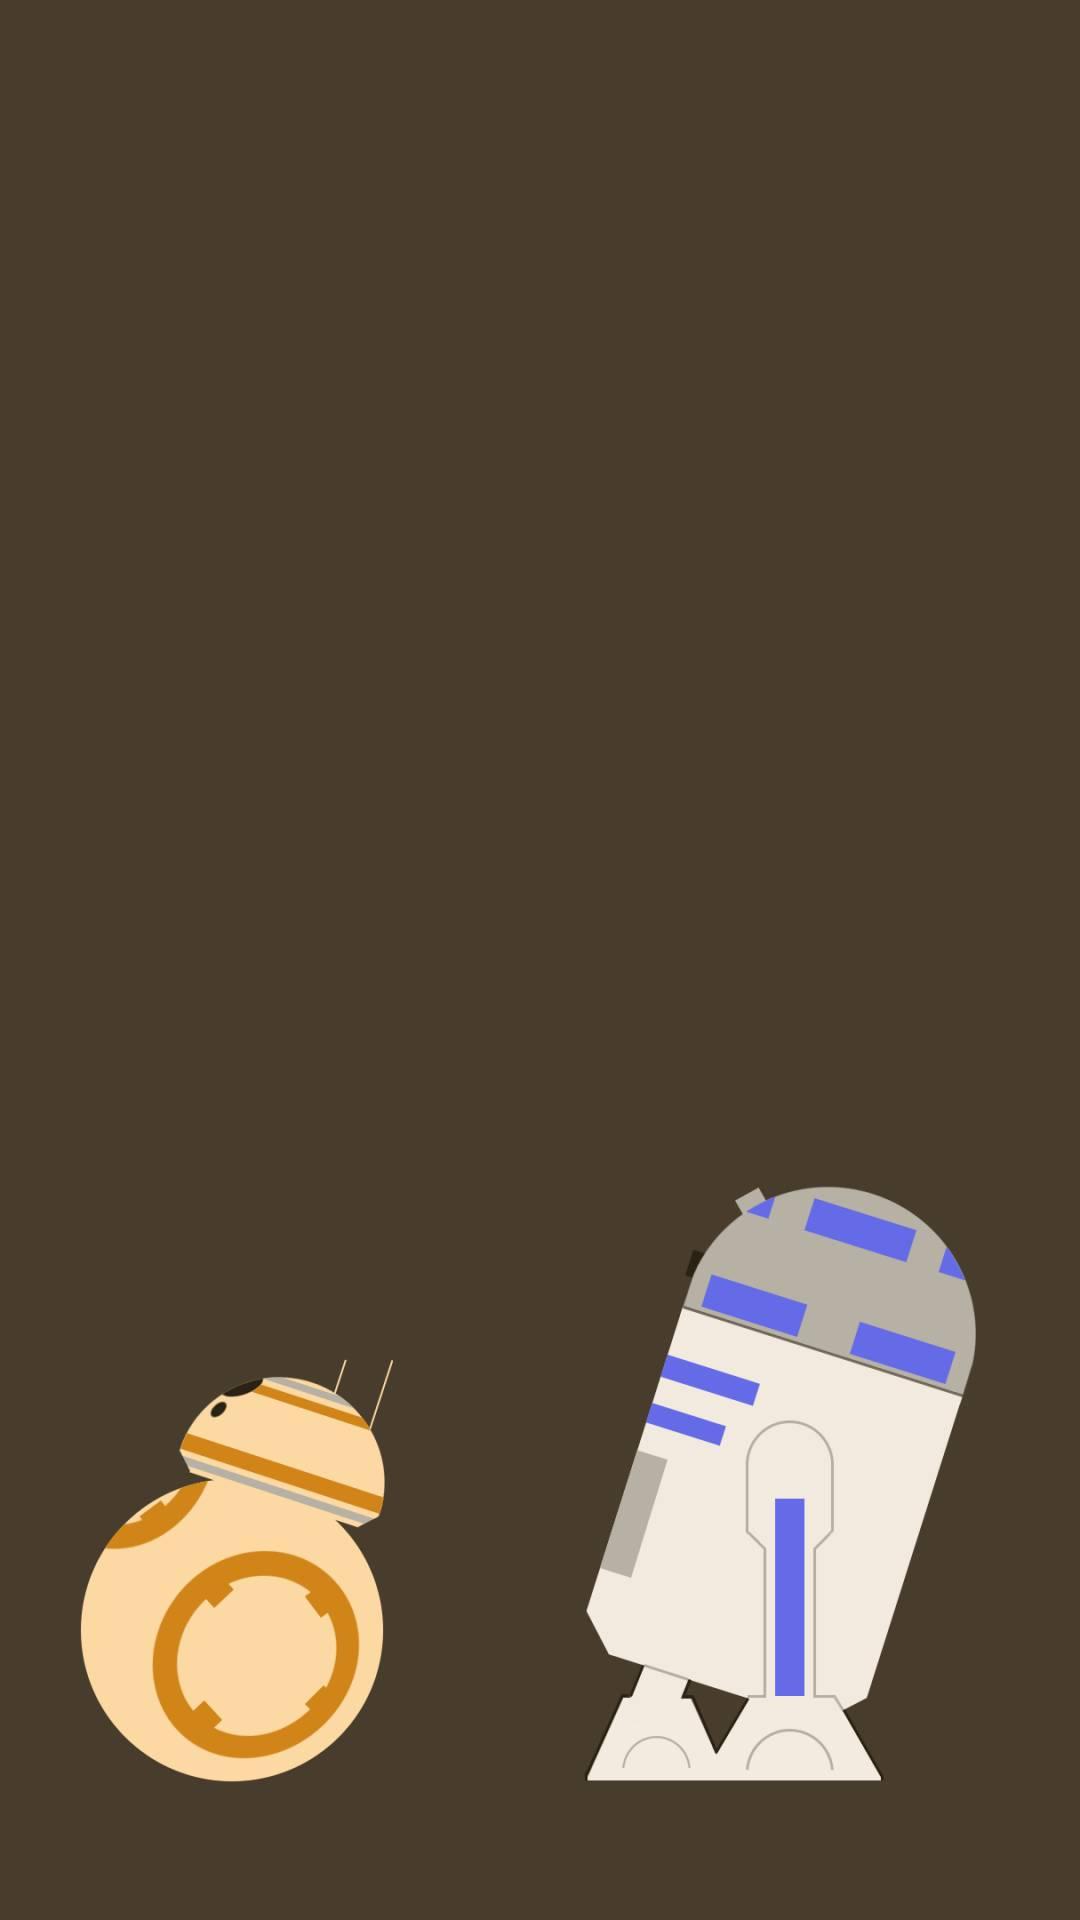 Star Wars Wallpaper Iphone 1080x1920 Download Hd Wallpaper Wallpapertip